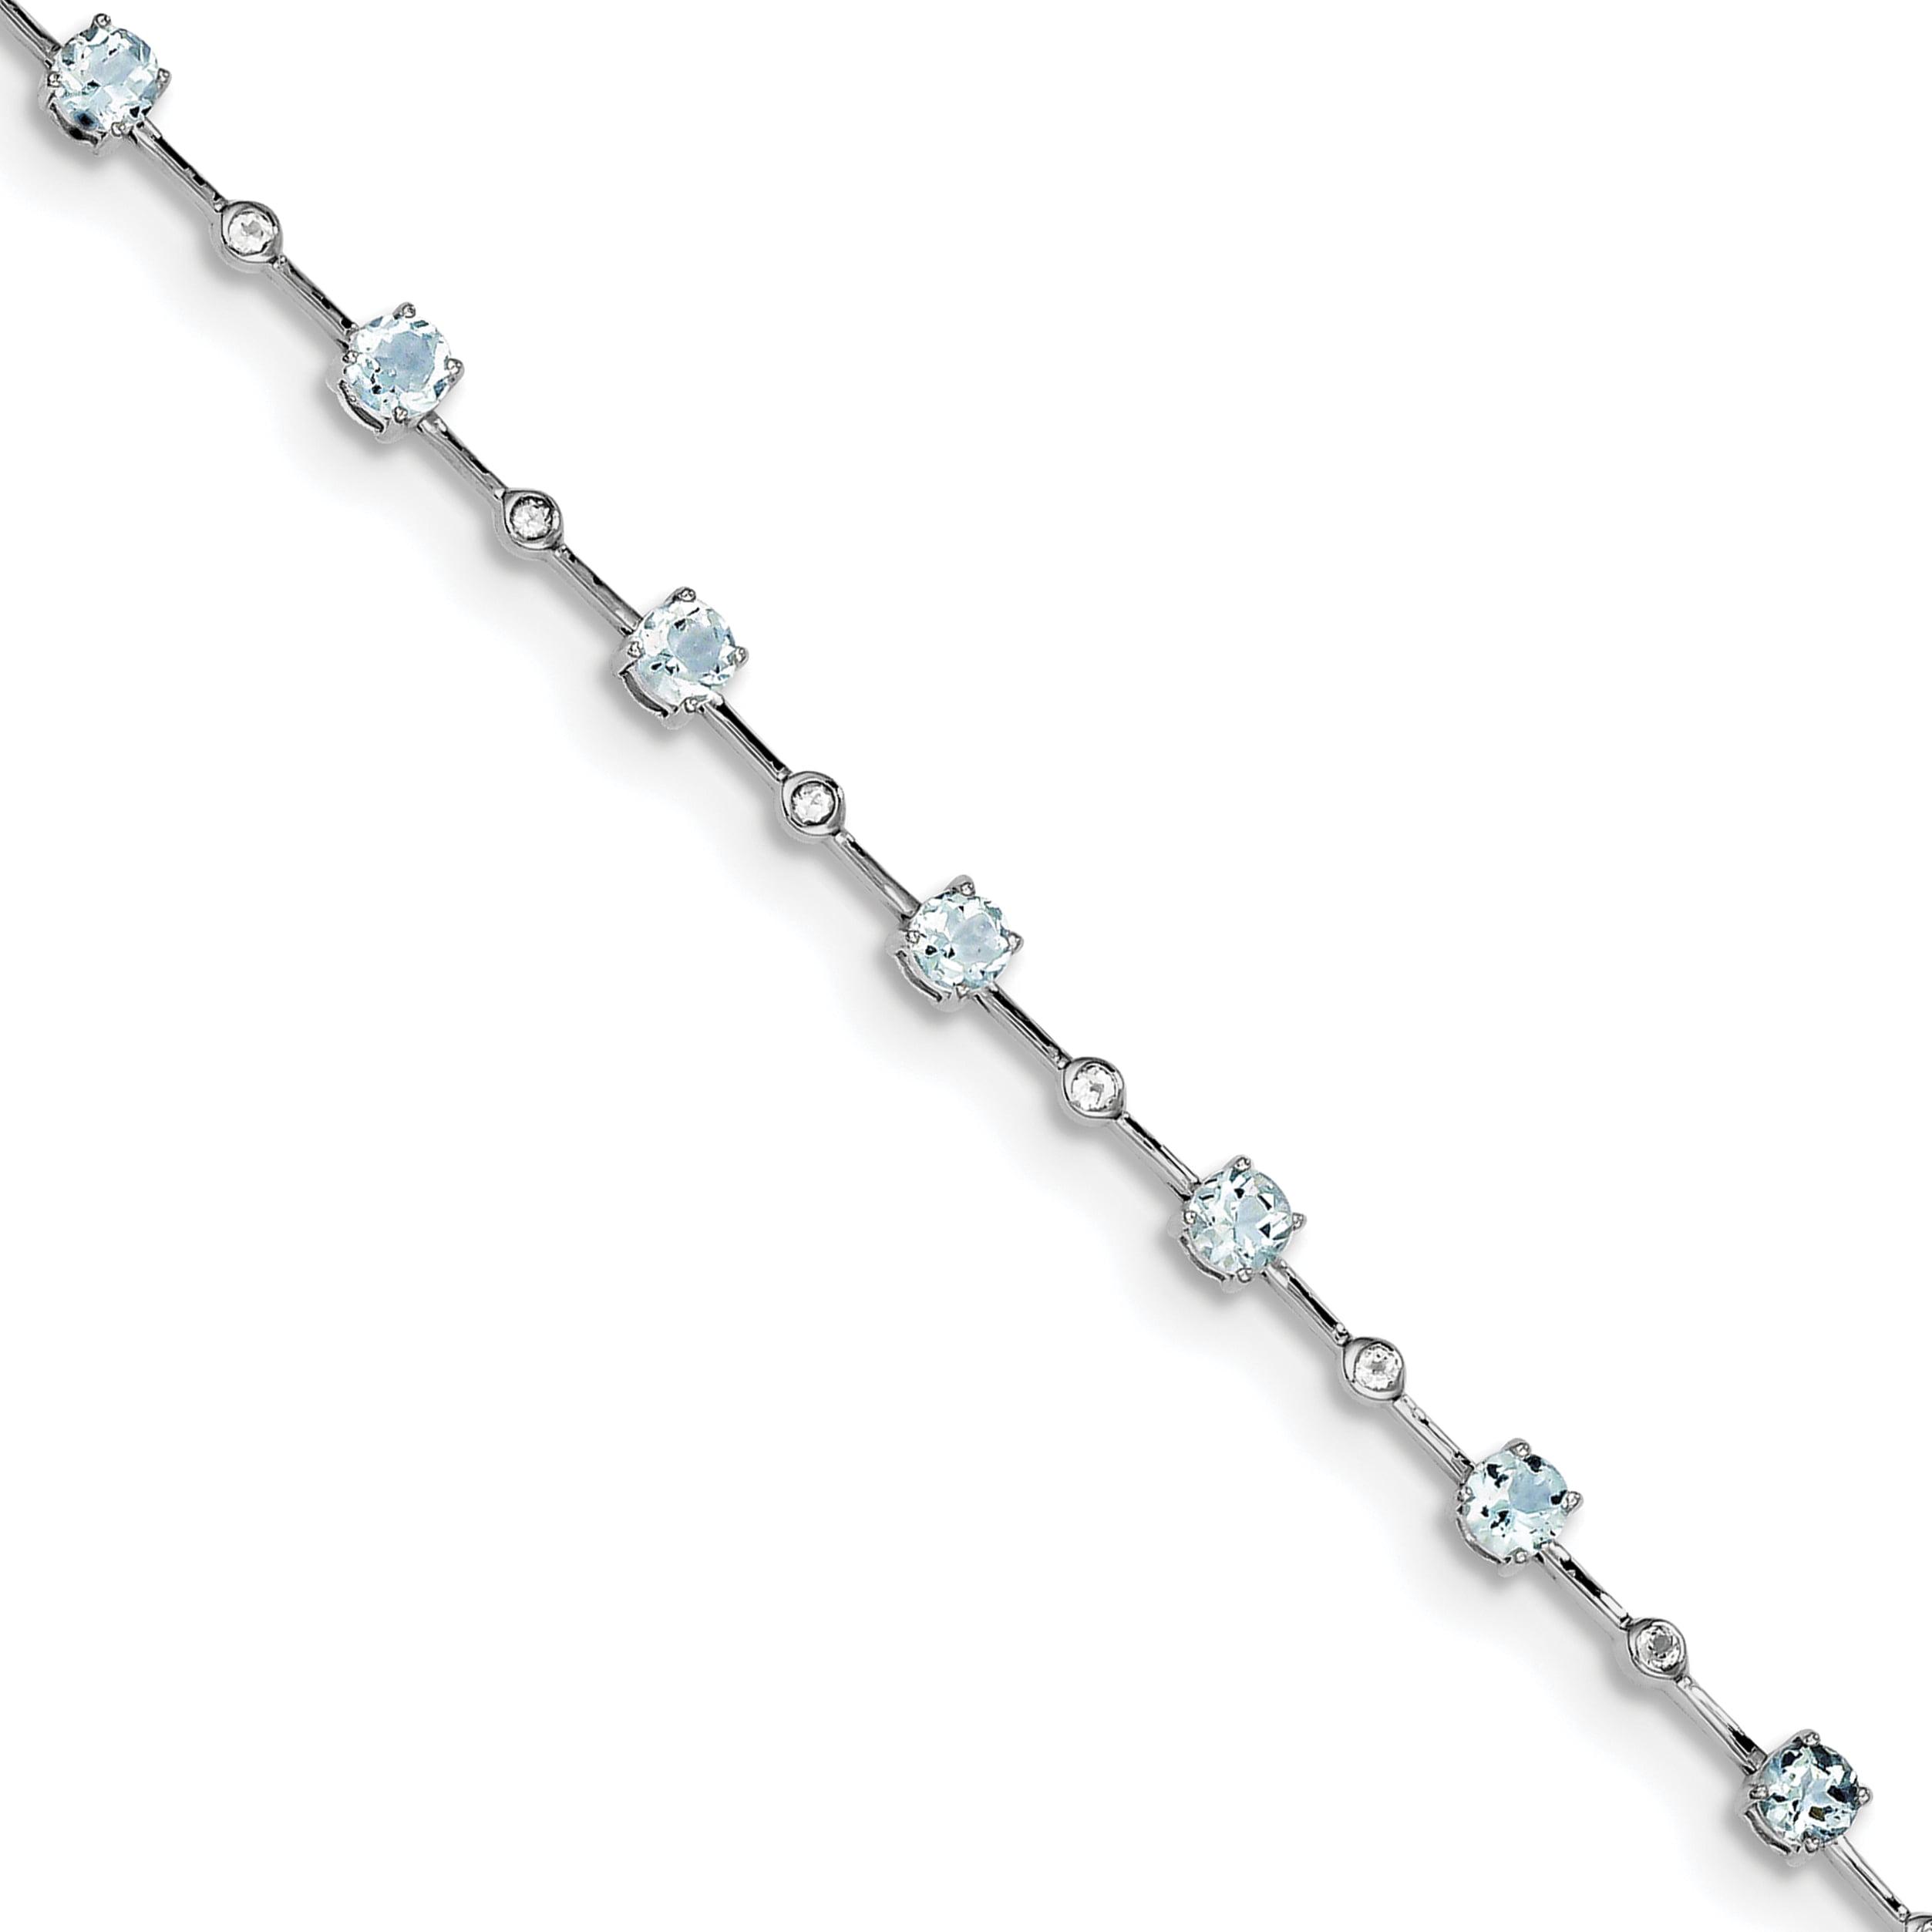 Sterling Silver Aquamarine White Topaz Bracelet by Kevin Jewelers